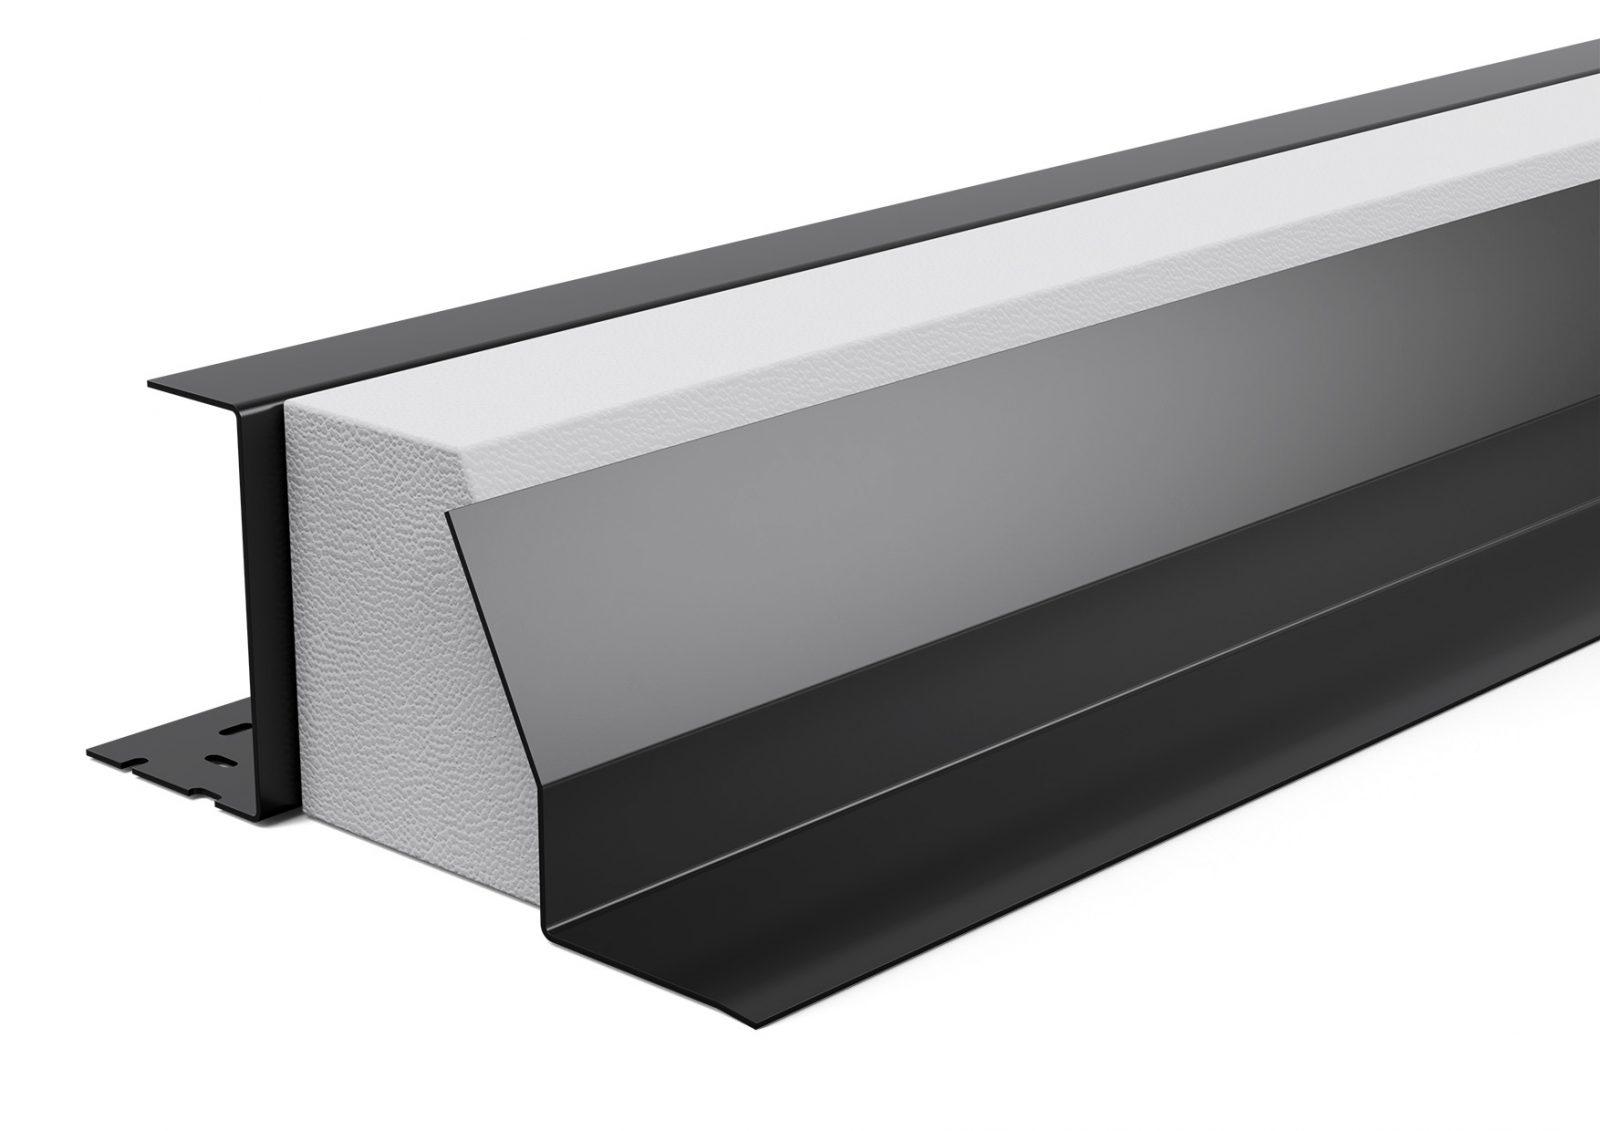 SSR2® used for bespoke porch detail for David Wilson development